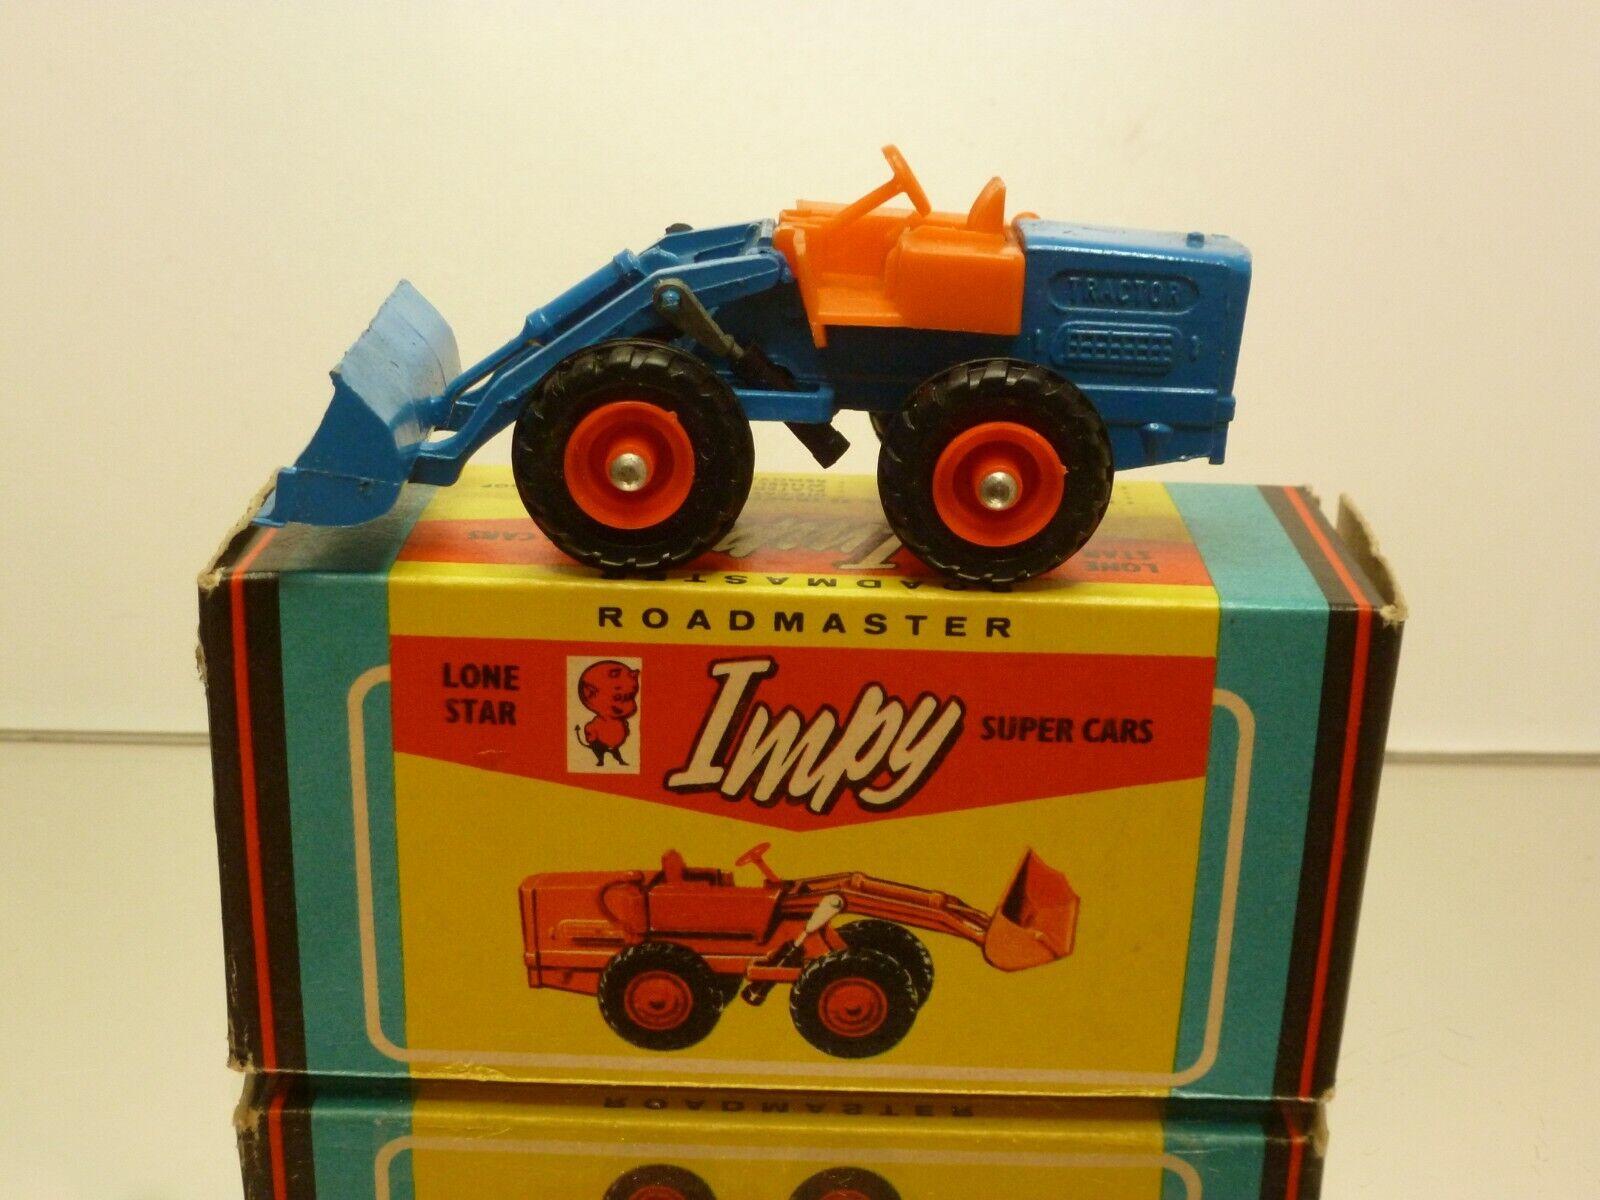 IMPY LONE STAR 25 TRACTOR WHEEL LOADER - blu + arancia - EXCELLENT IN BOX